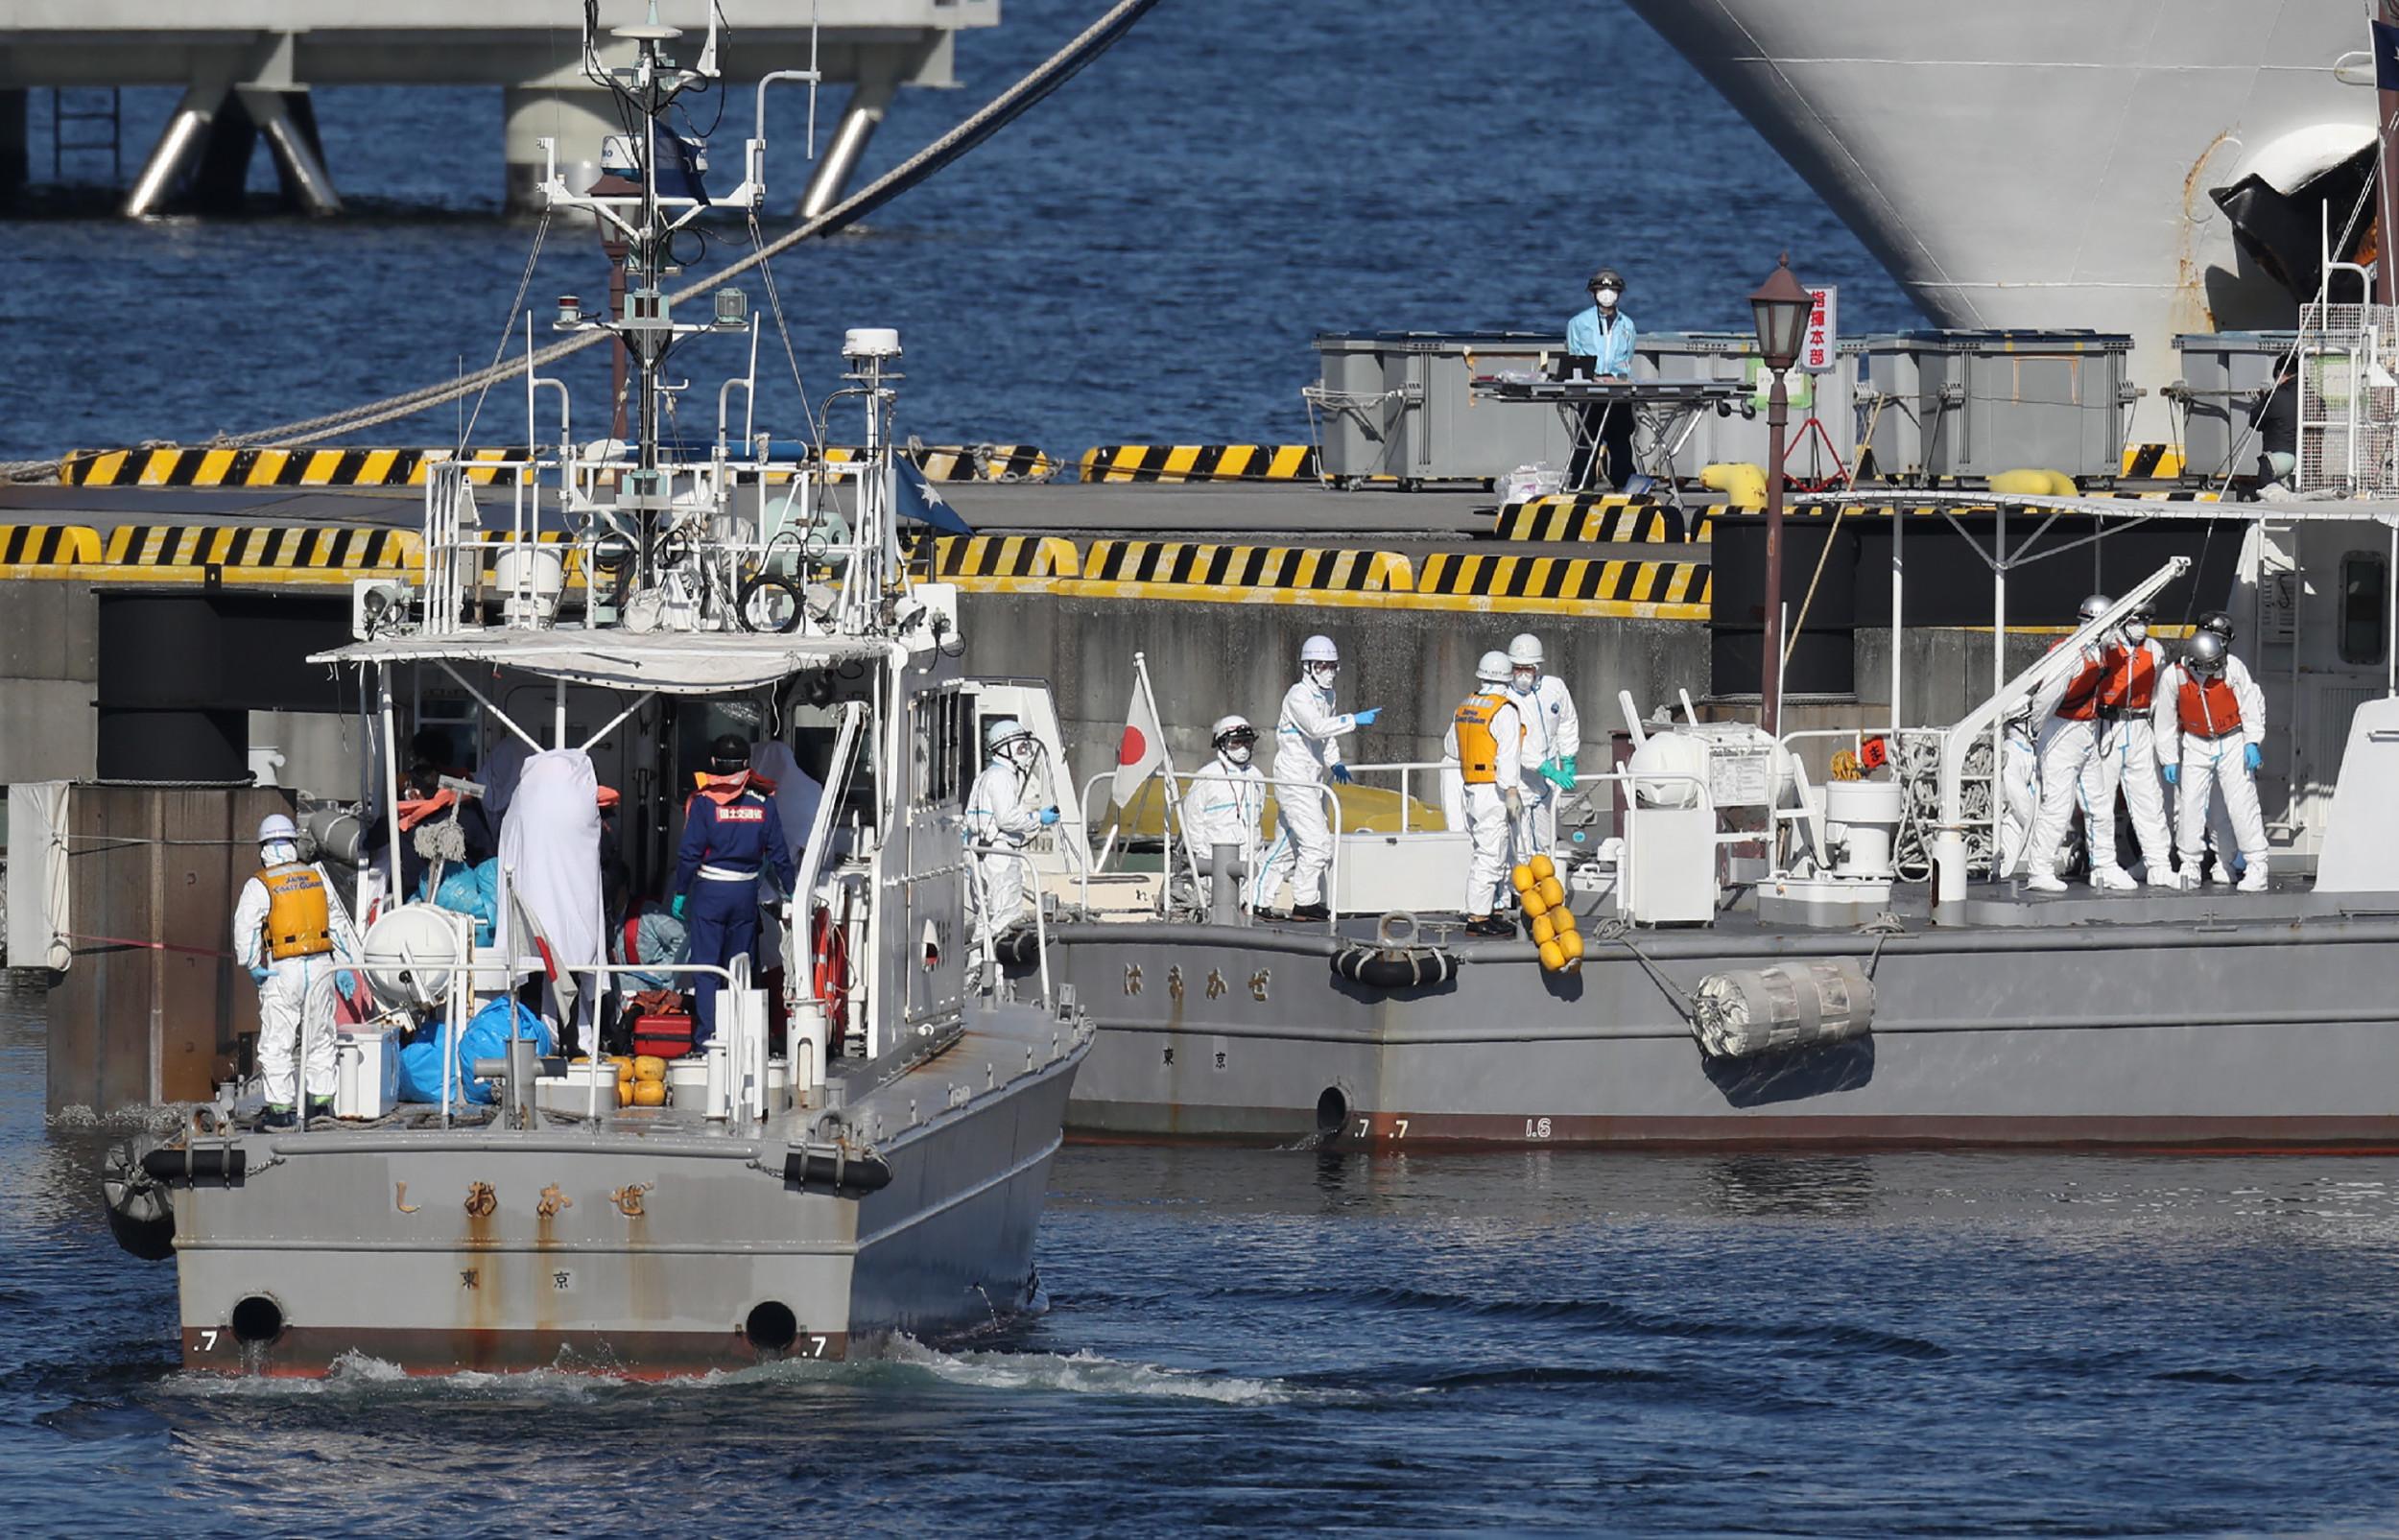 AMERICAN AMONG THOSE TESTING POSITIVE FOR CORONAVIRUS ON QUARANTINED CRUISE SHIP